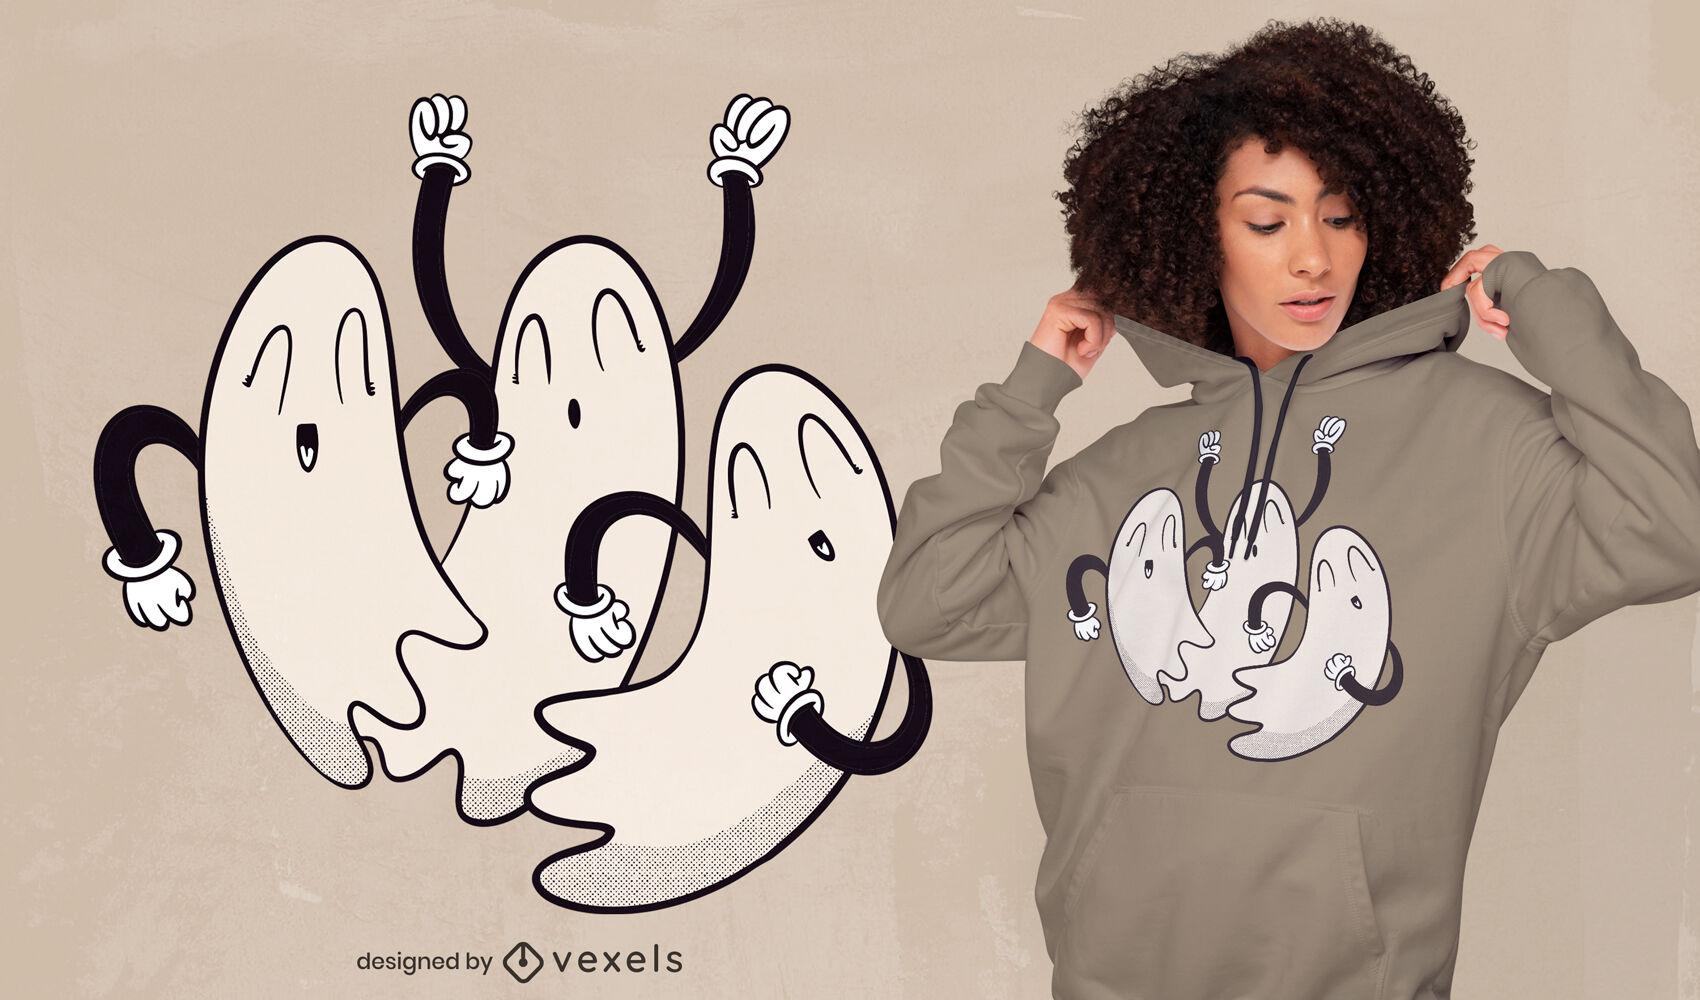 ANFRAGE Coole Geister T-Shirt Design Retro Cartoon